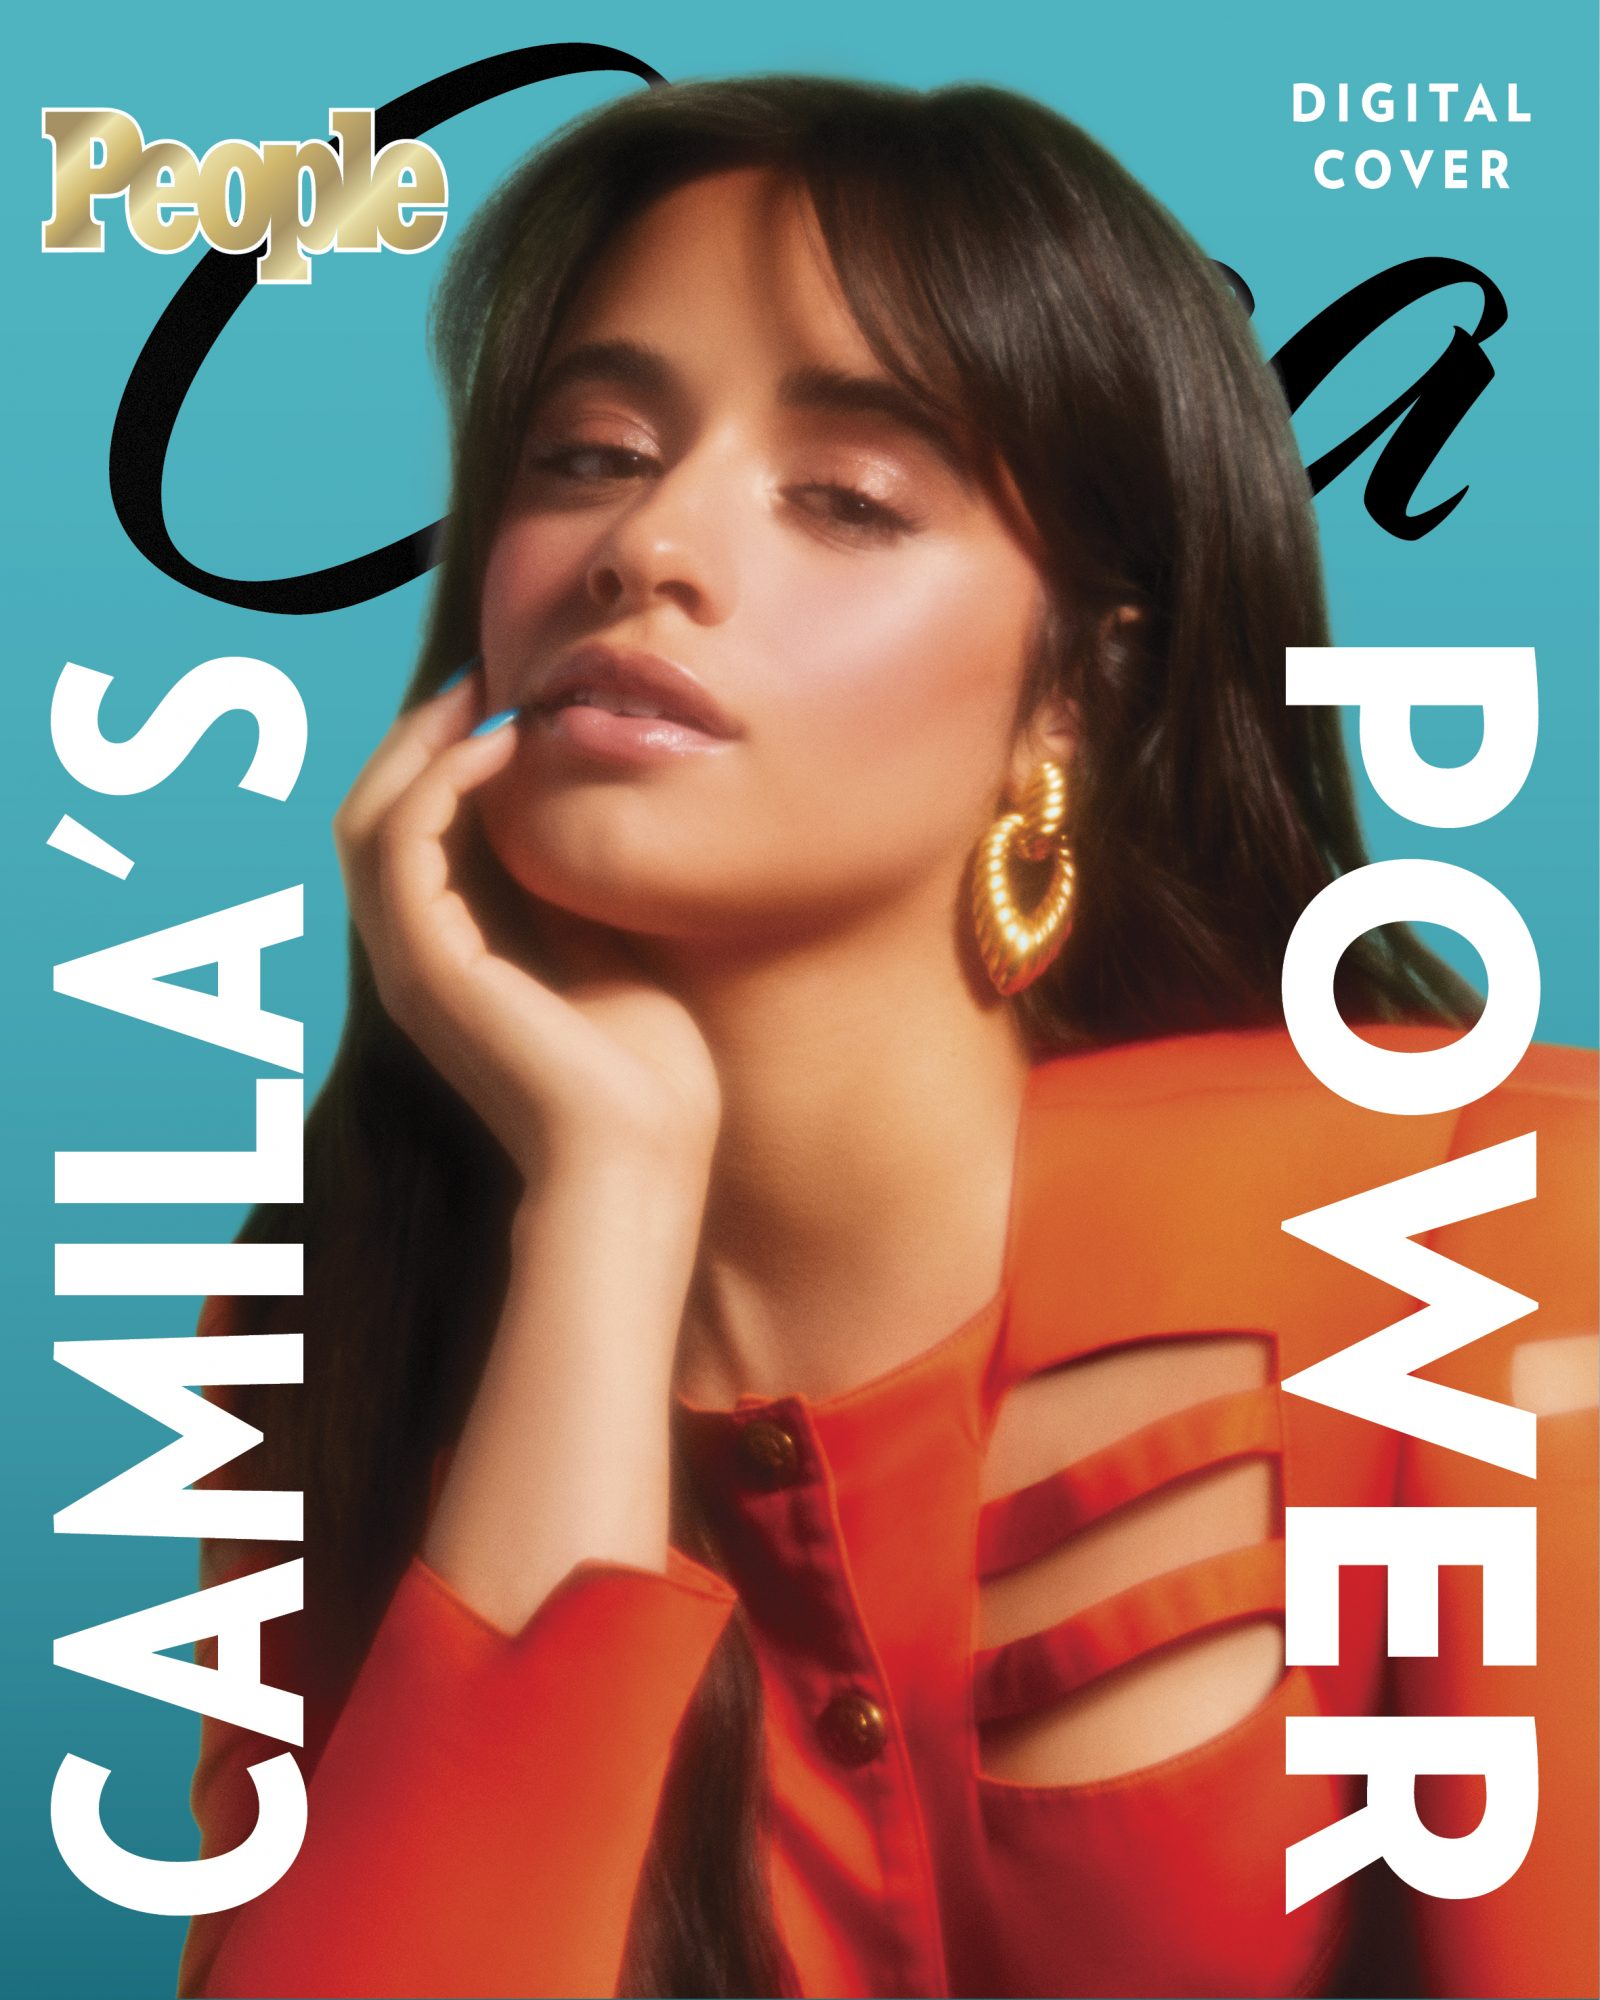 Camila Cabello digital cover CHICA